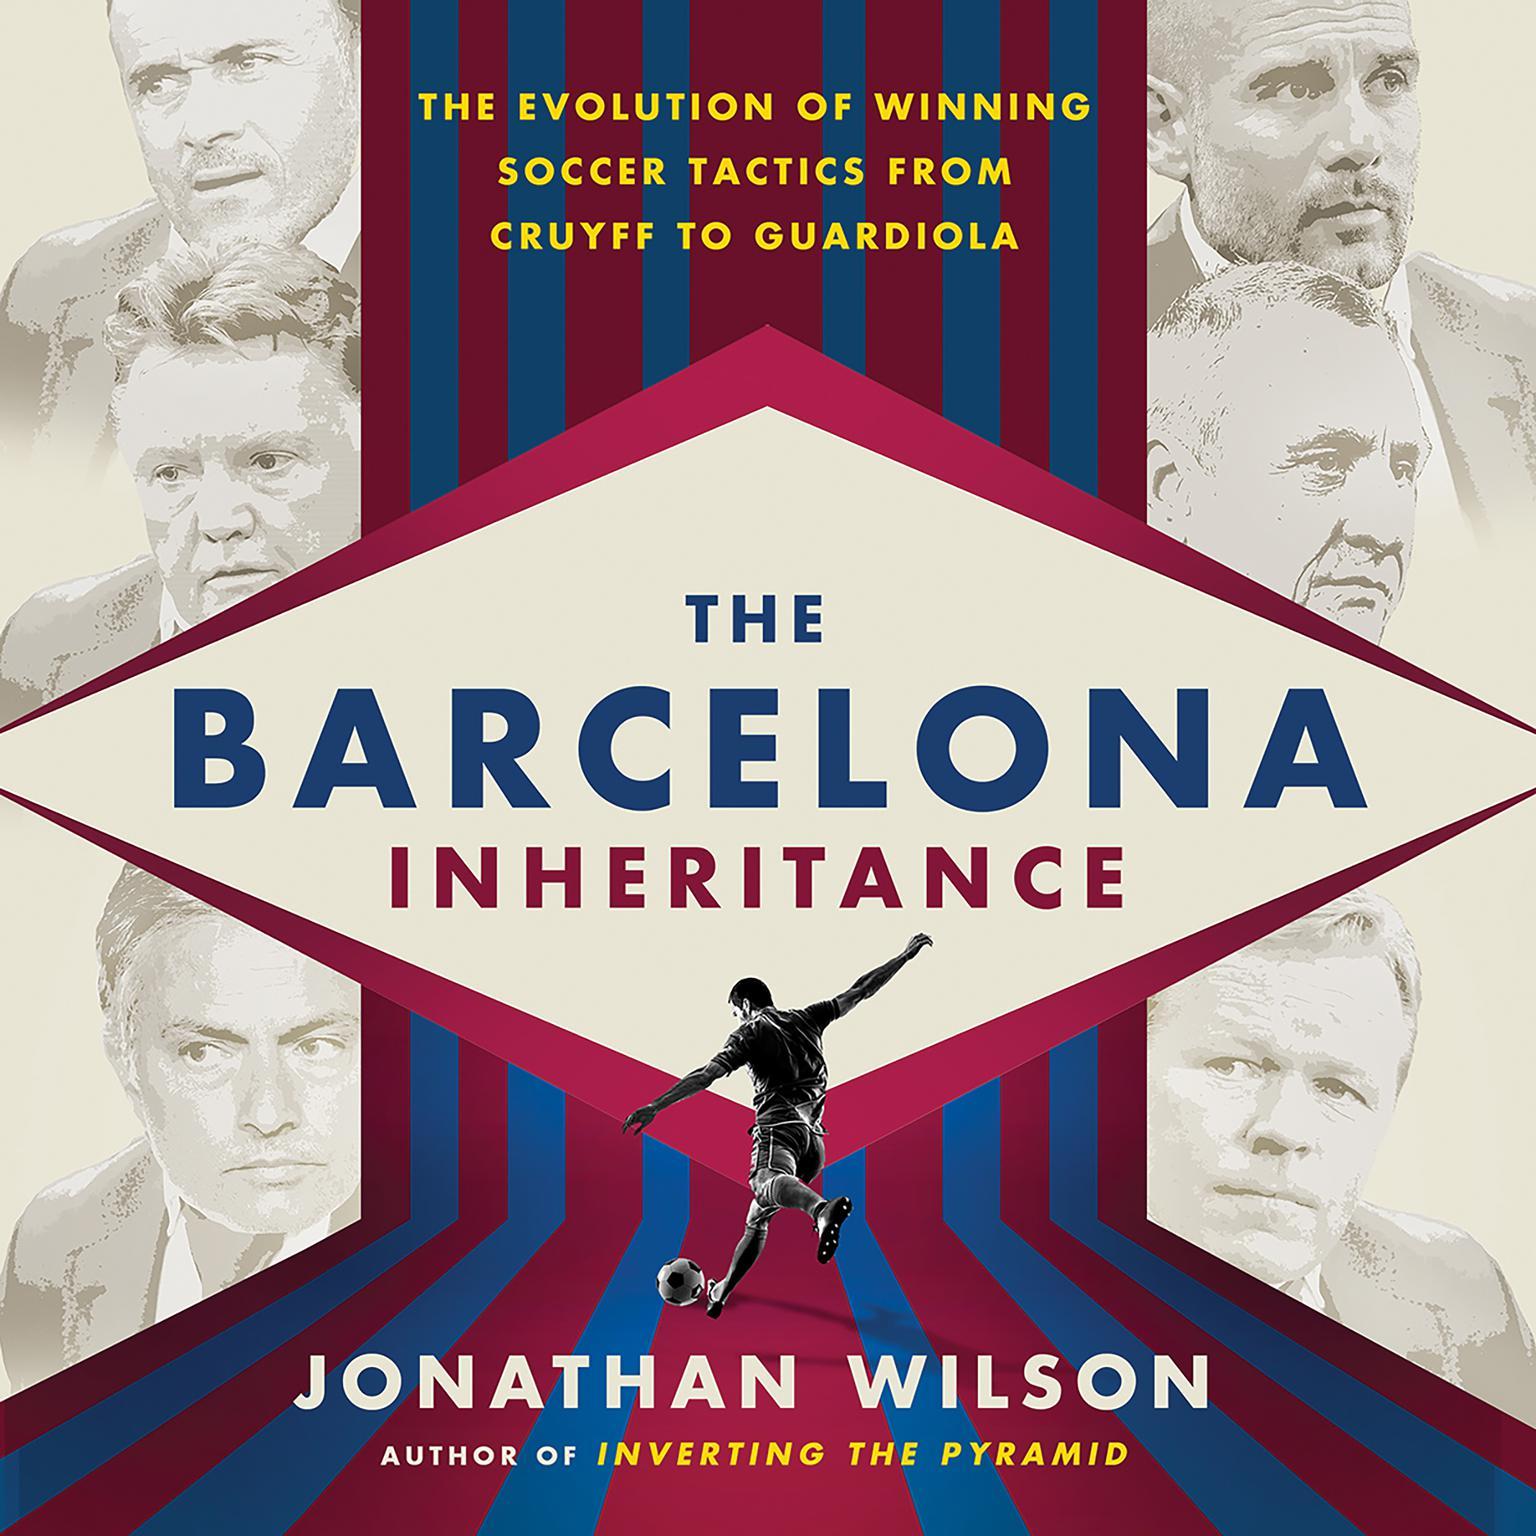 The Barcelona Inheritance: The Evolution of Winning Soccer Tactics from Cruyff to Guardiola Audiobook, by Jonathan Wilson